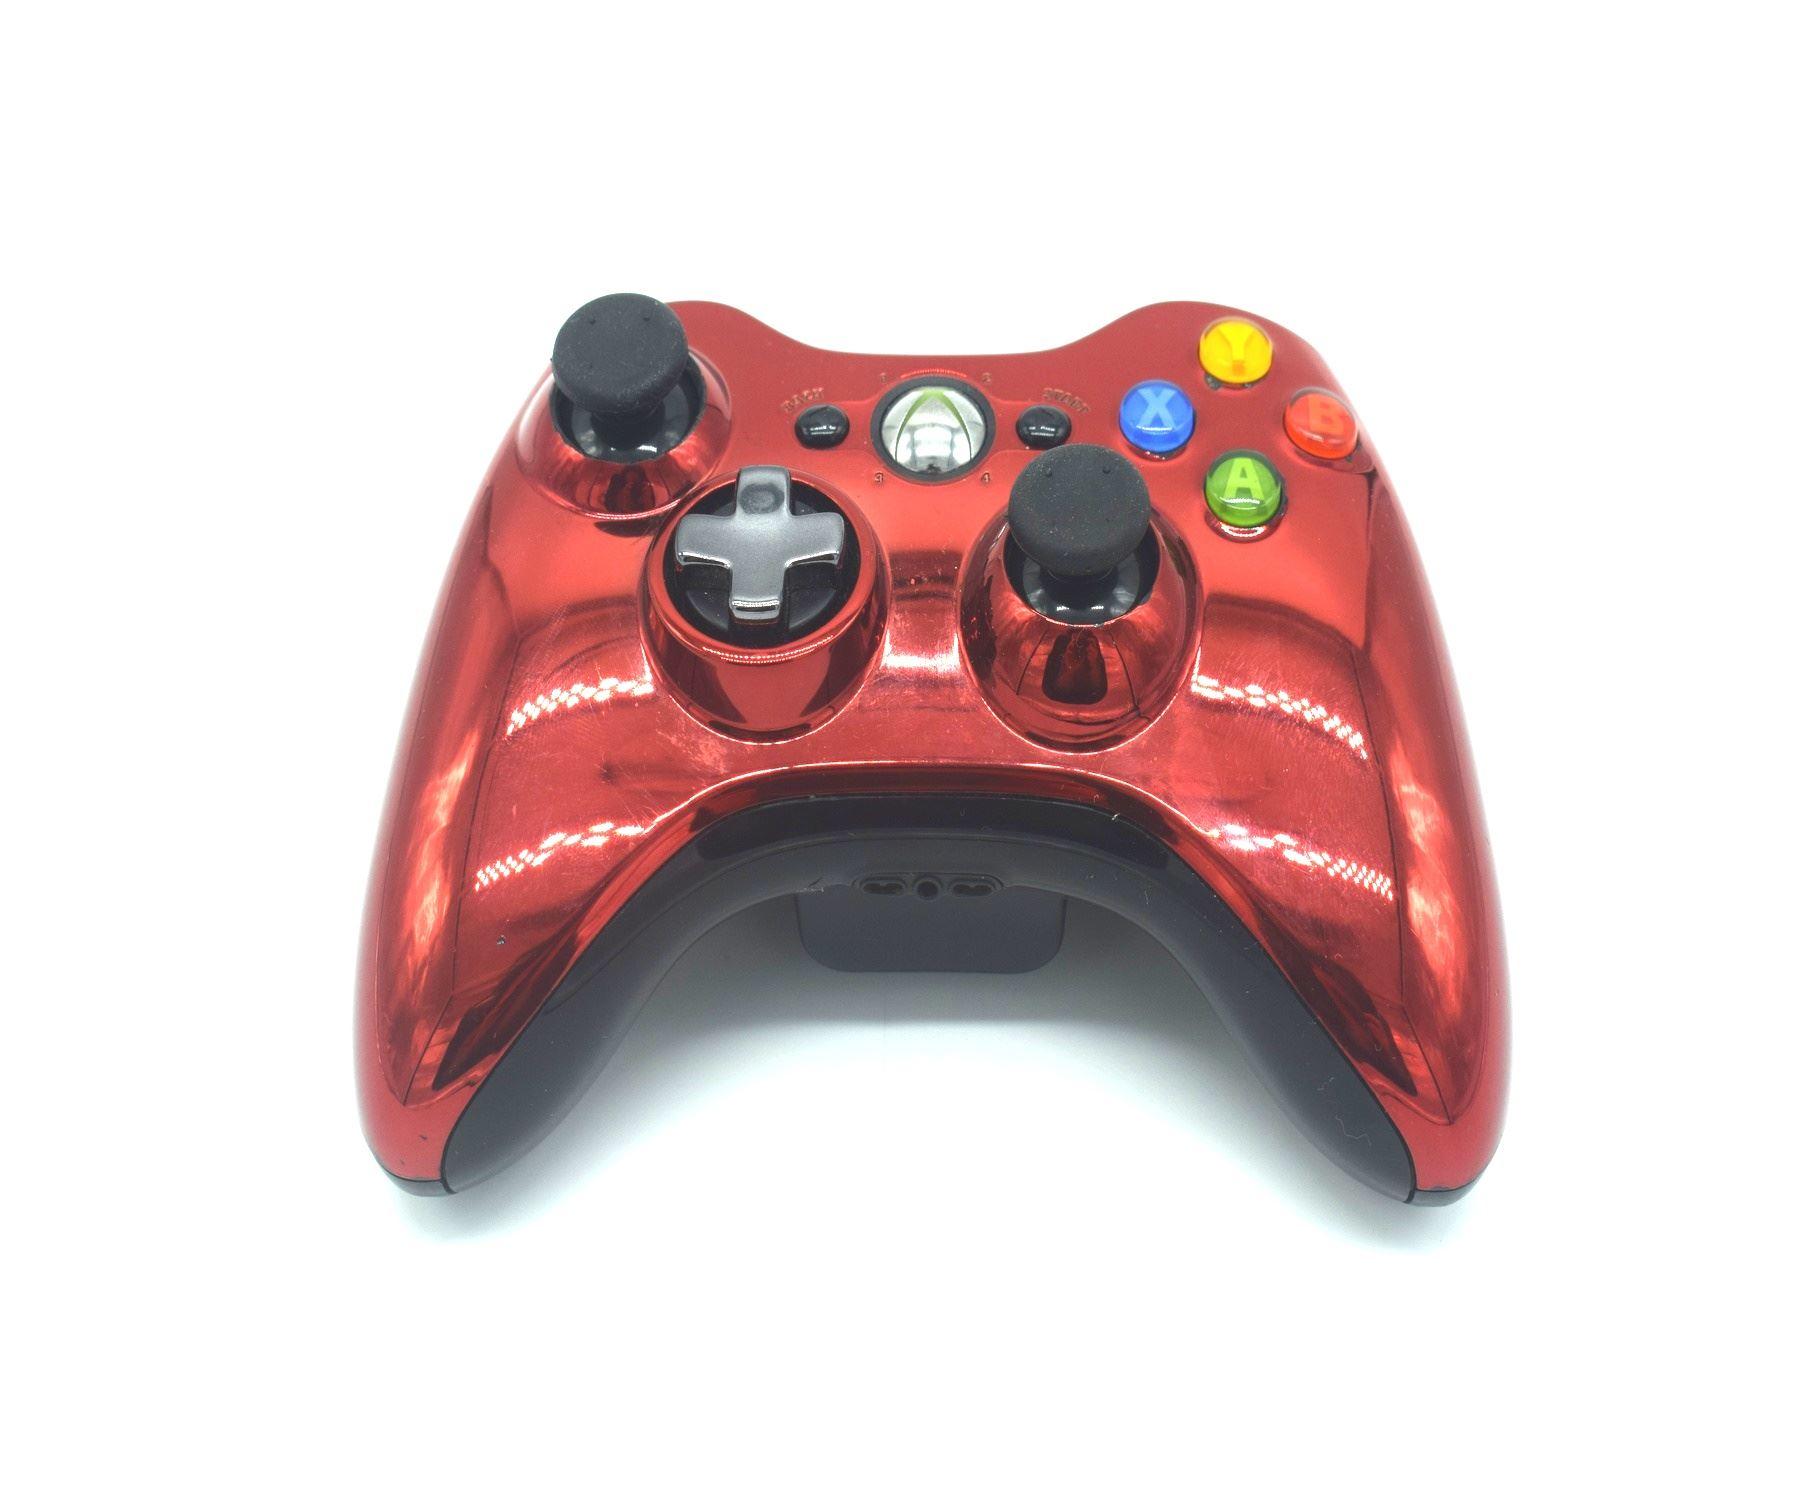 Official-Original-Genuine-Microsoft-Xbox-360-Controller-Pads-Various-Colours thumbnail 26